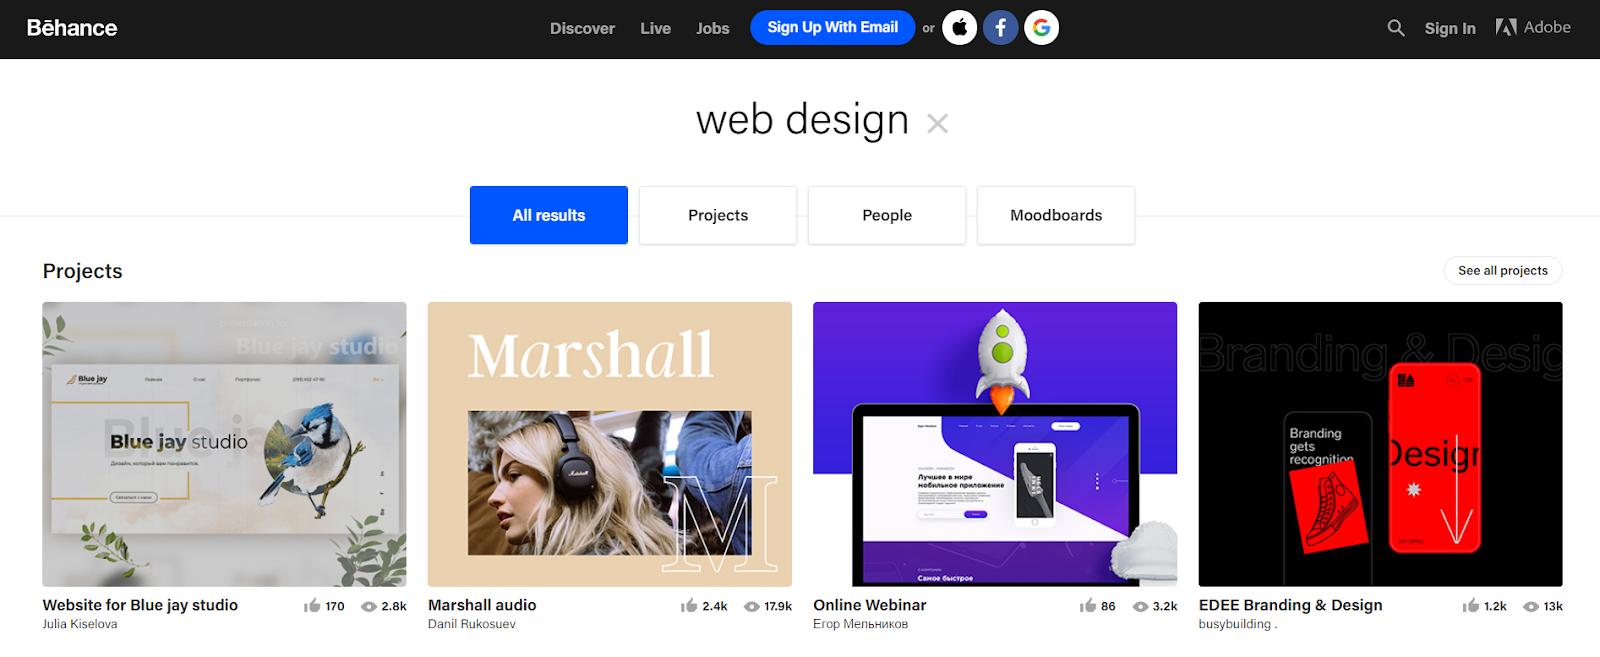 Behance homepage, website design ideas.